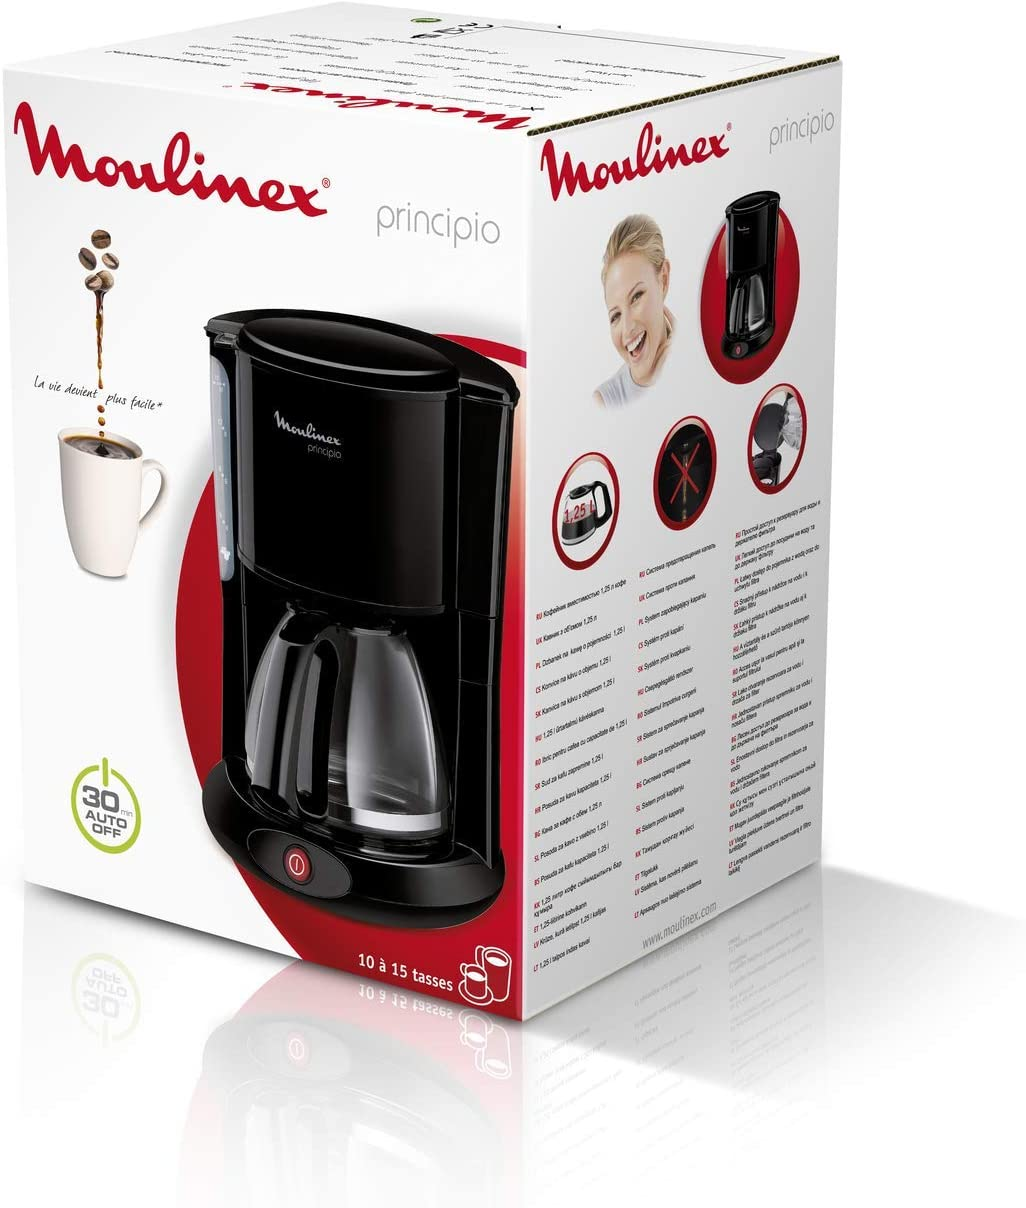 Moulinex Fg2601 Macchina per Il Caffè R8C